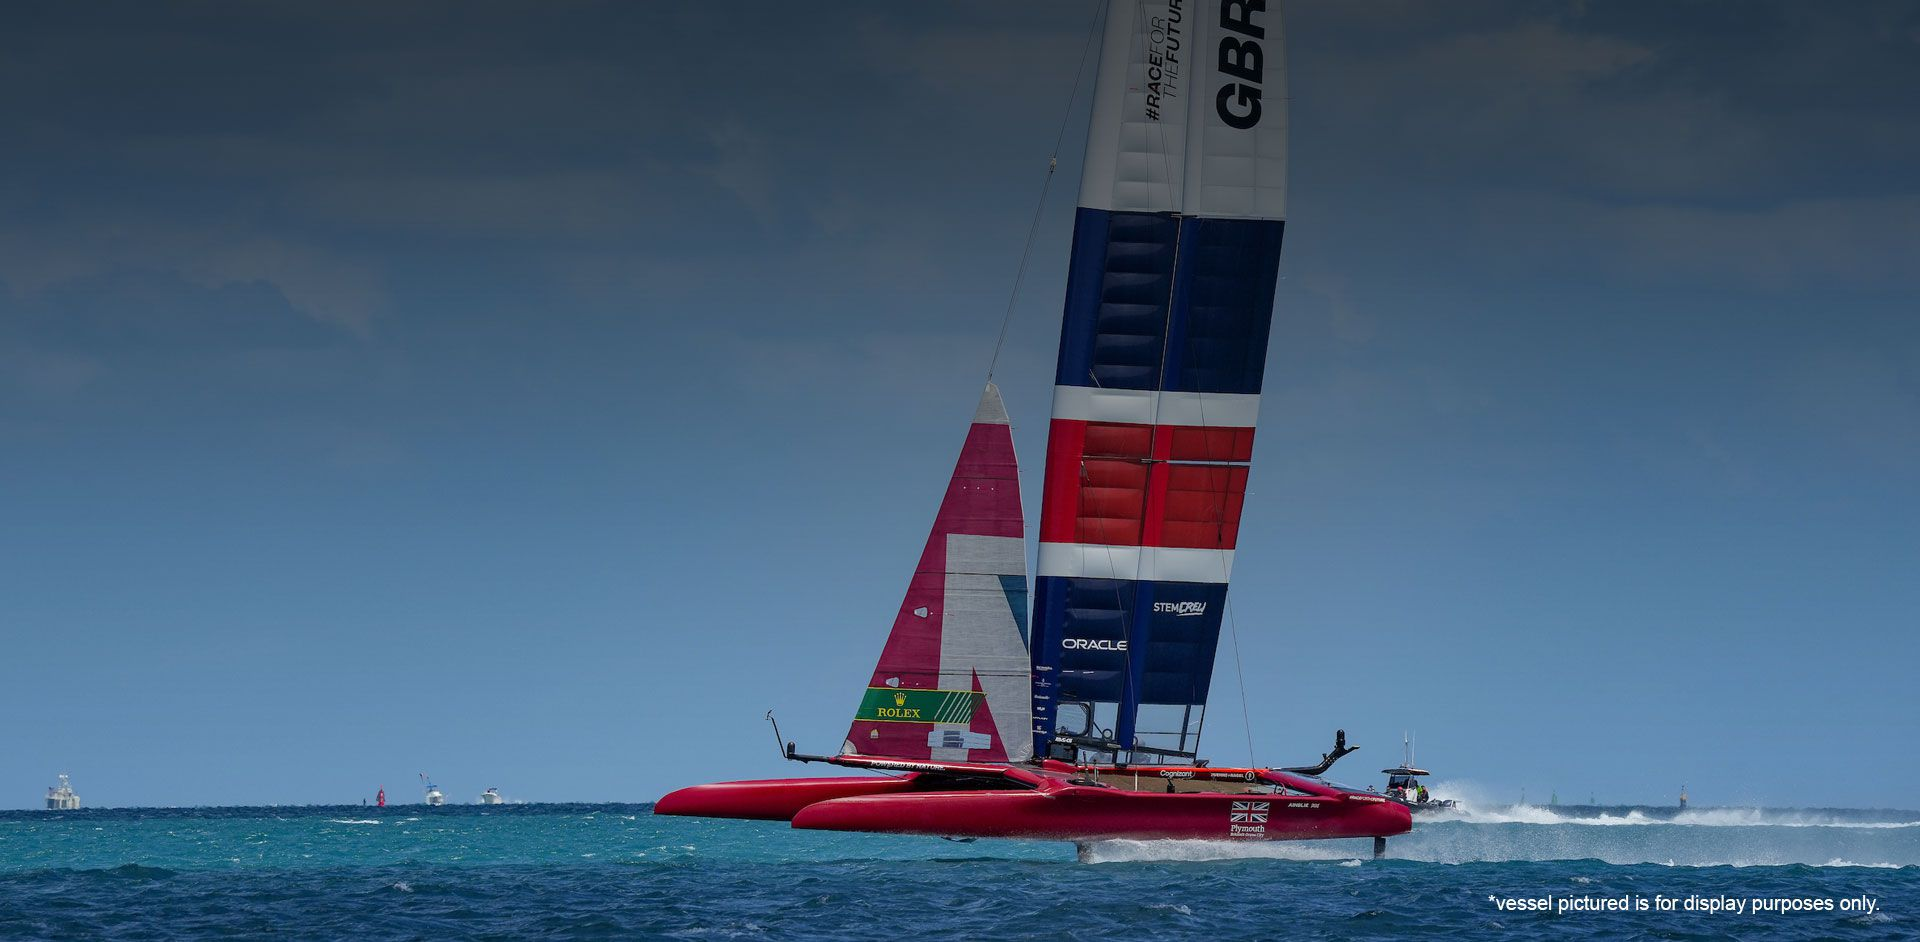 SailGP's – Official Access Spectator Boats - Slide 2